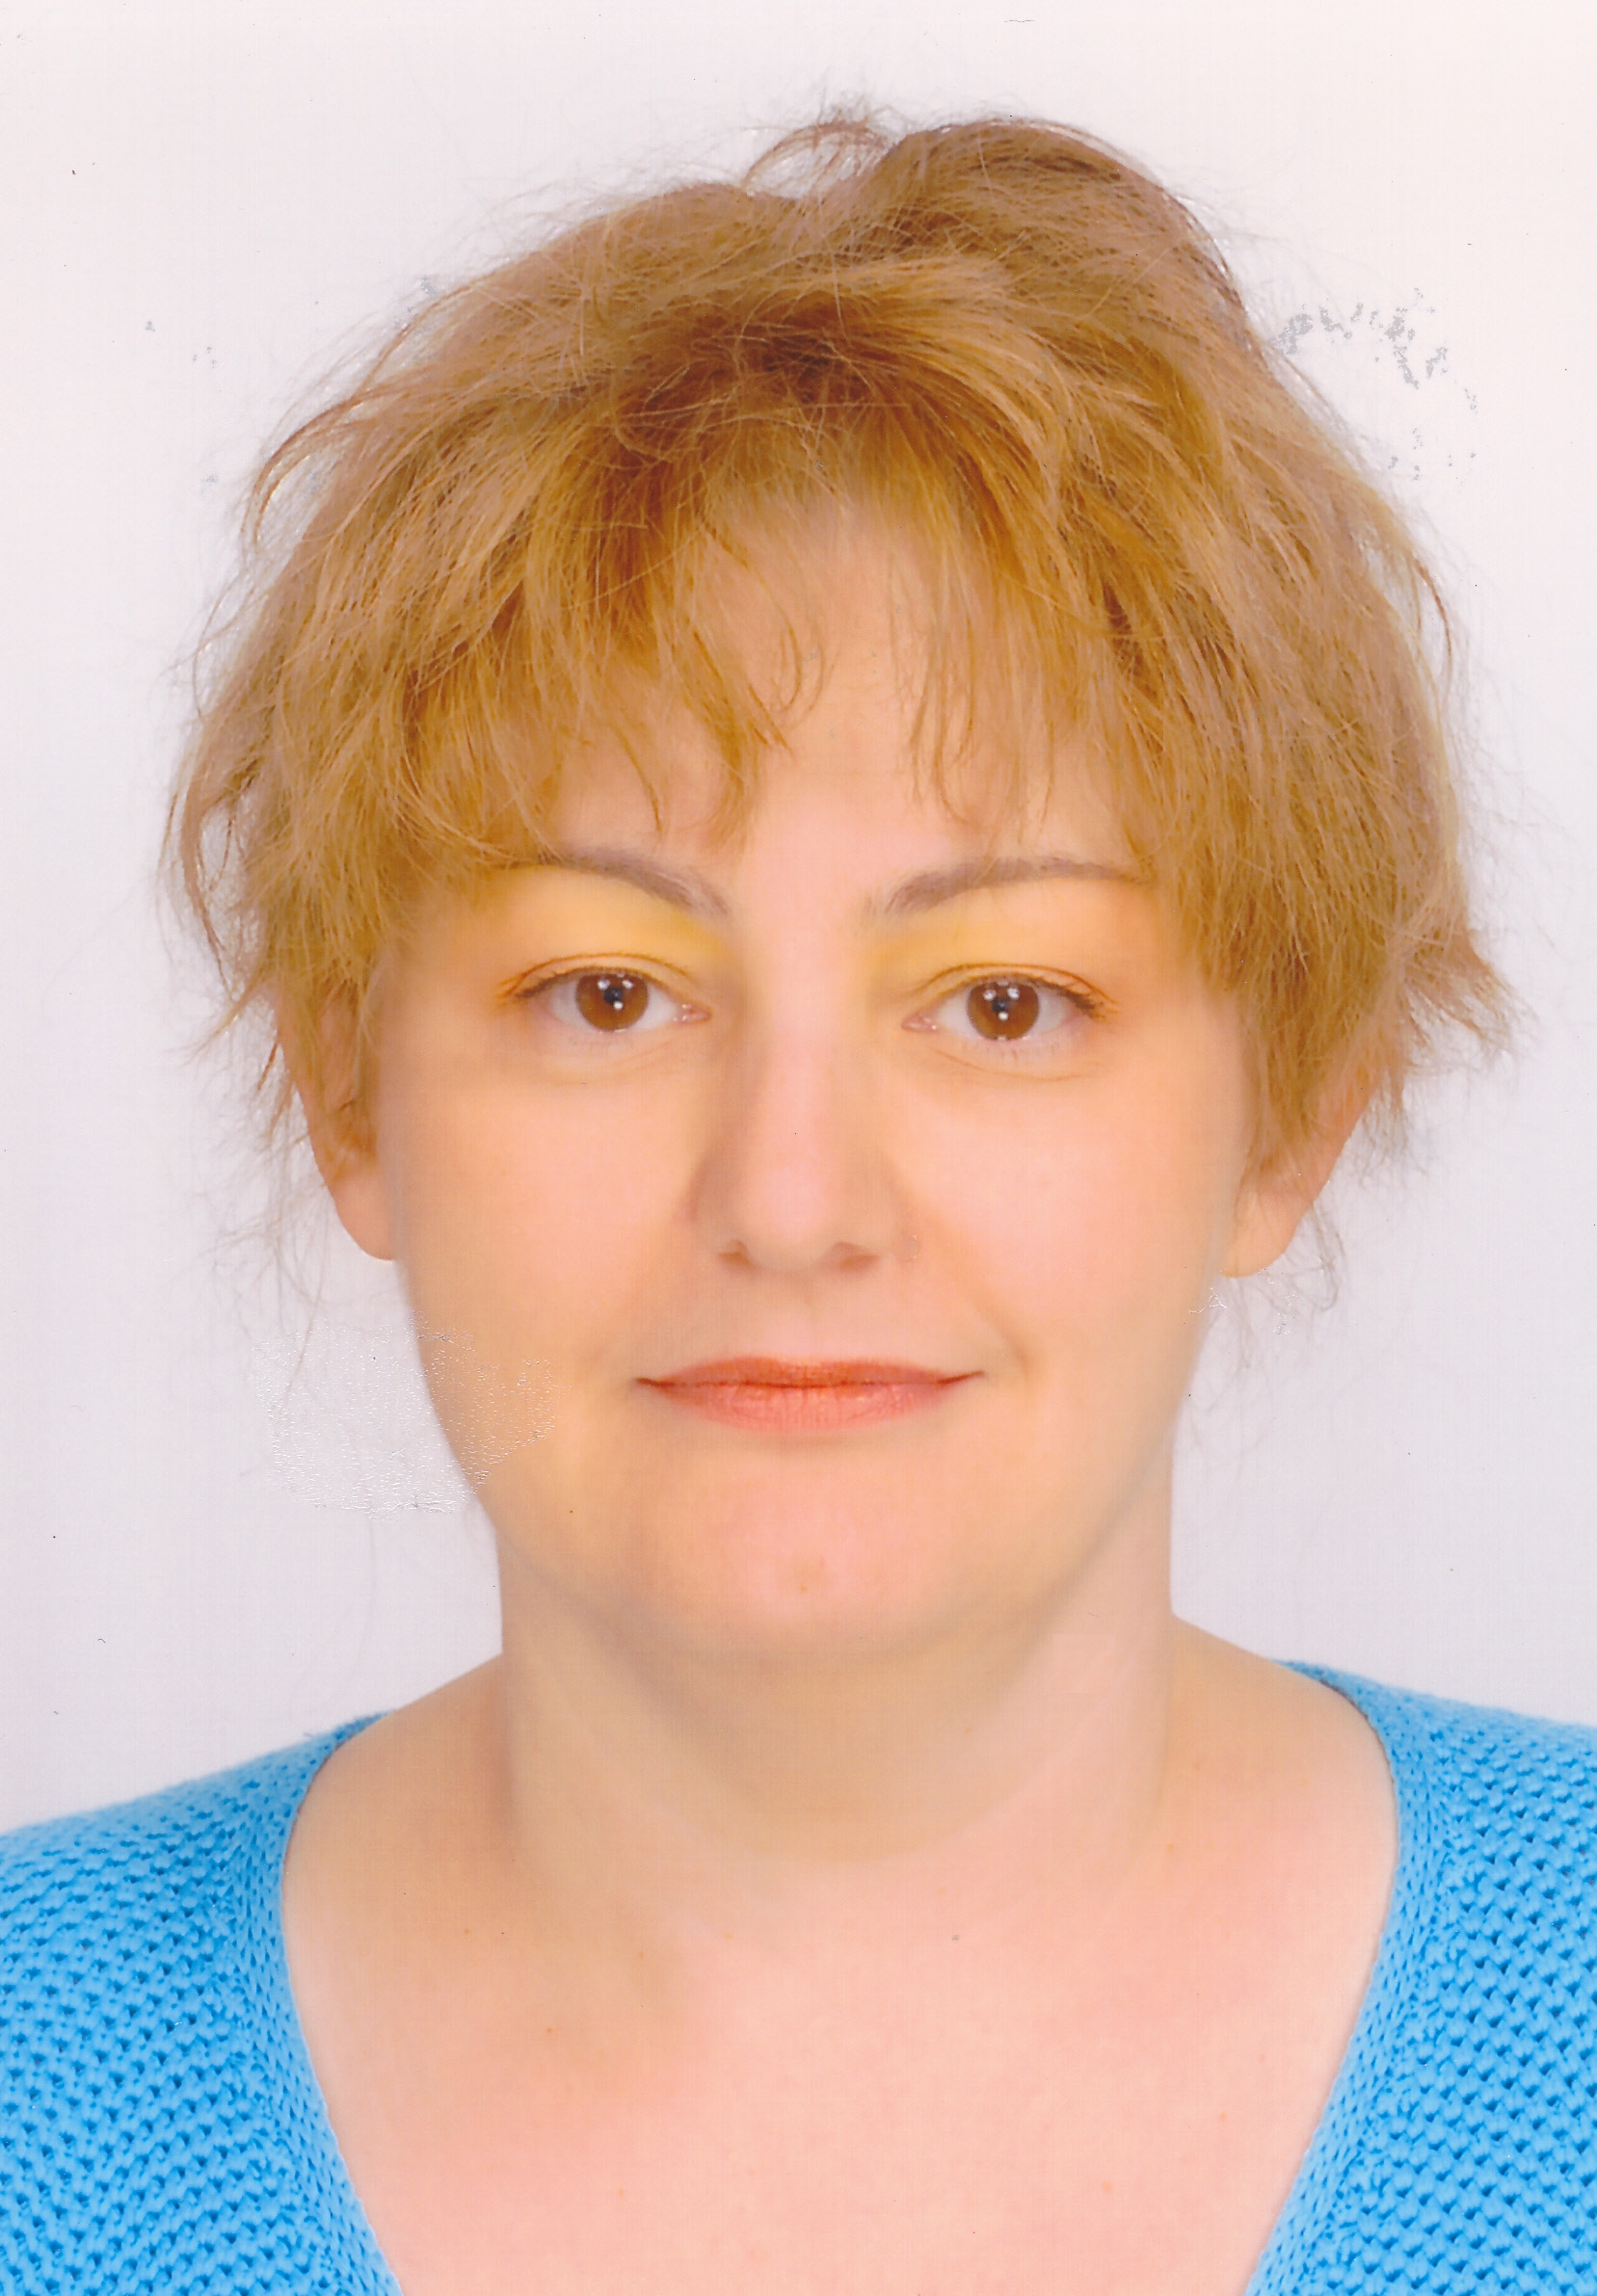 ALESSANDRA TASSI maestra di qigong a Milano